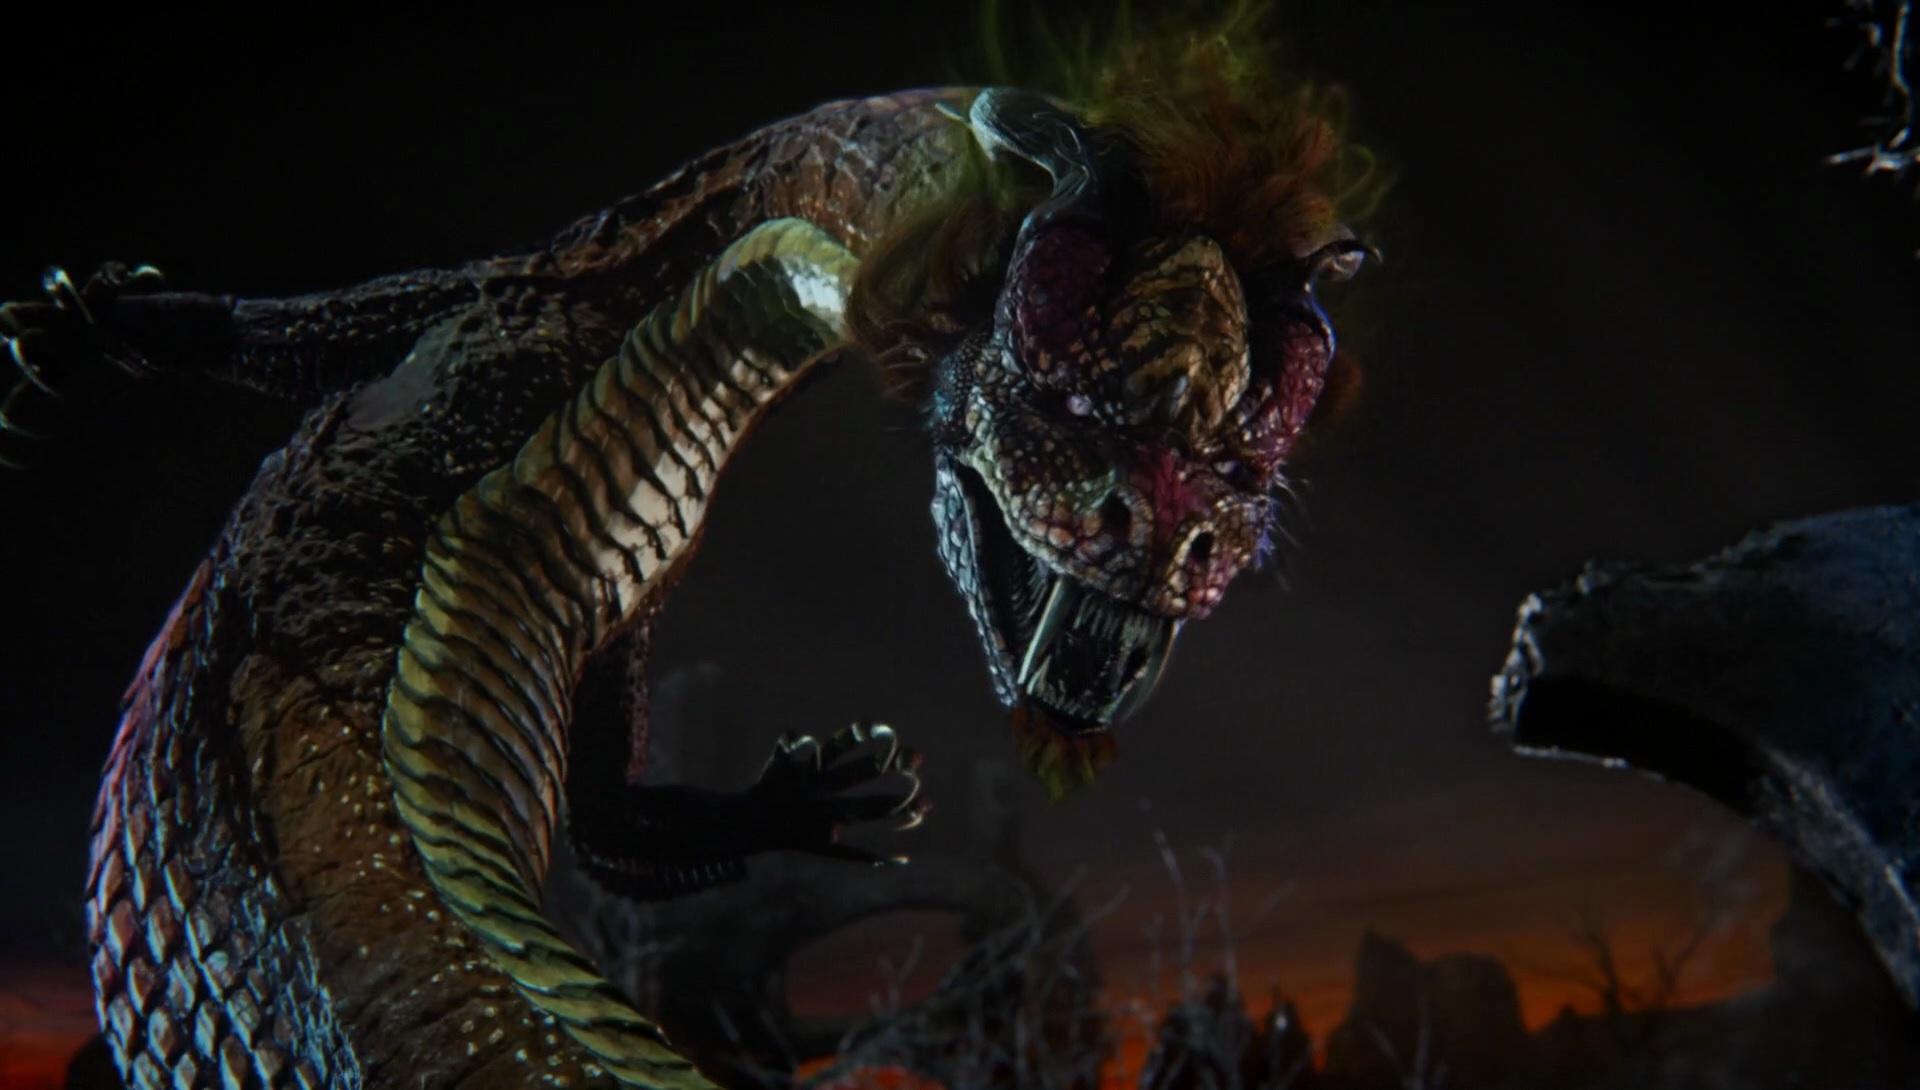 Dragon (Once Upon a Time)